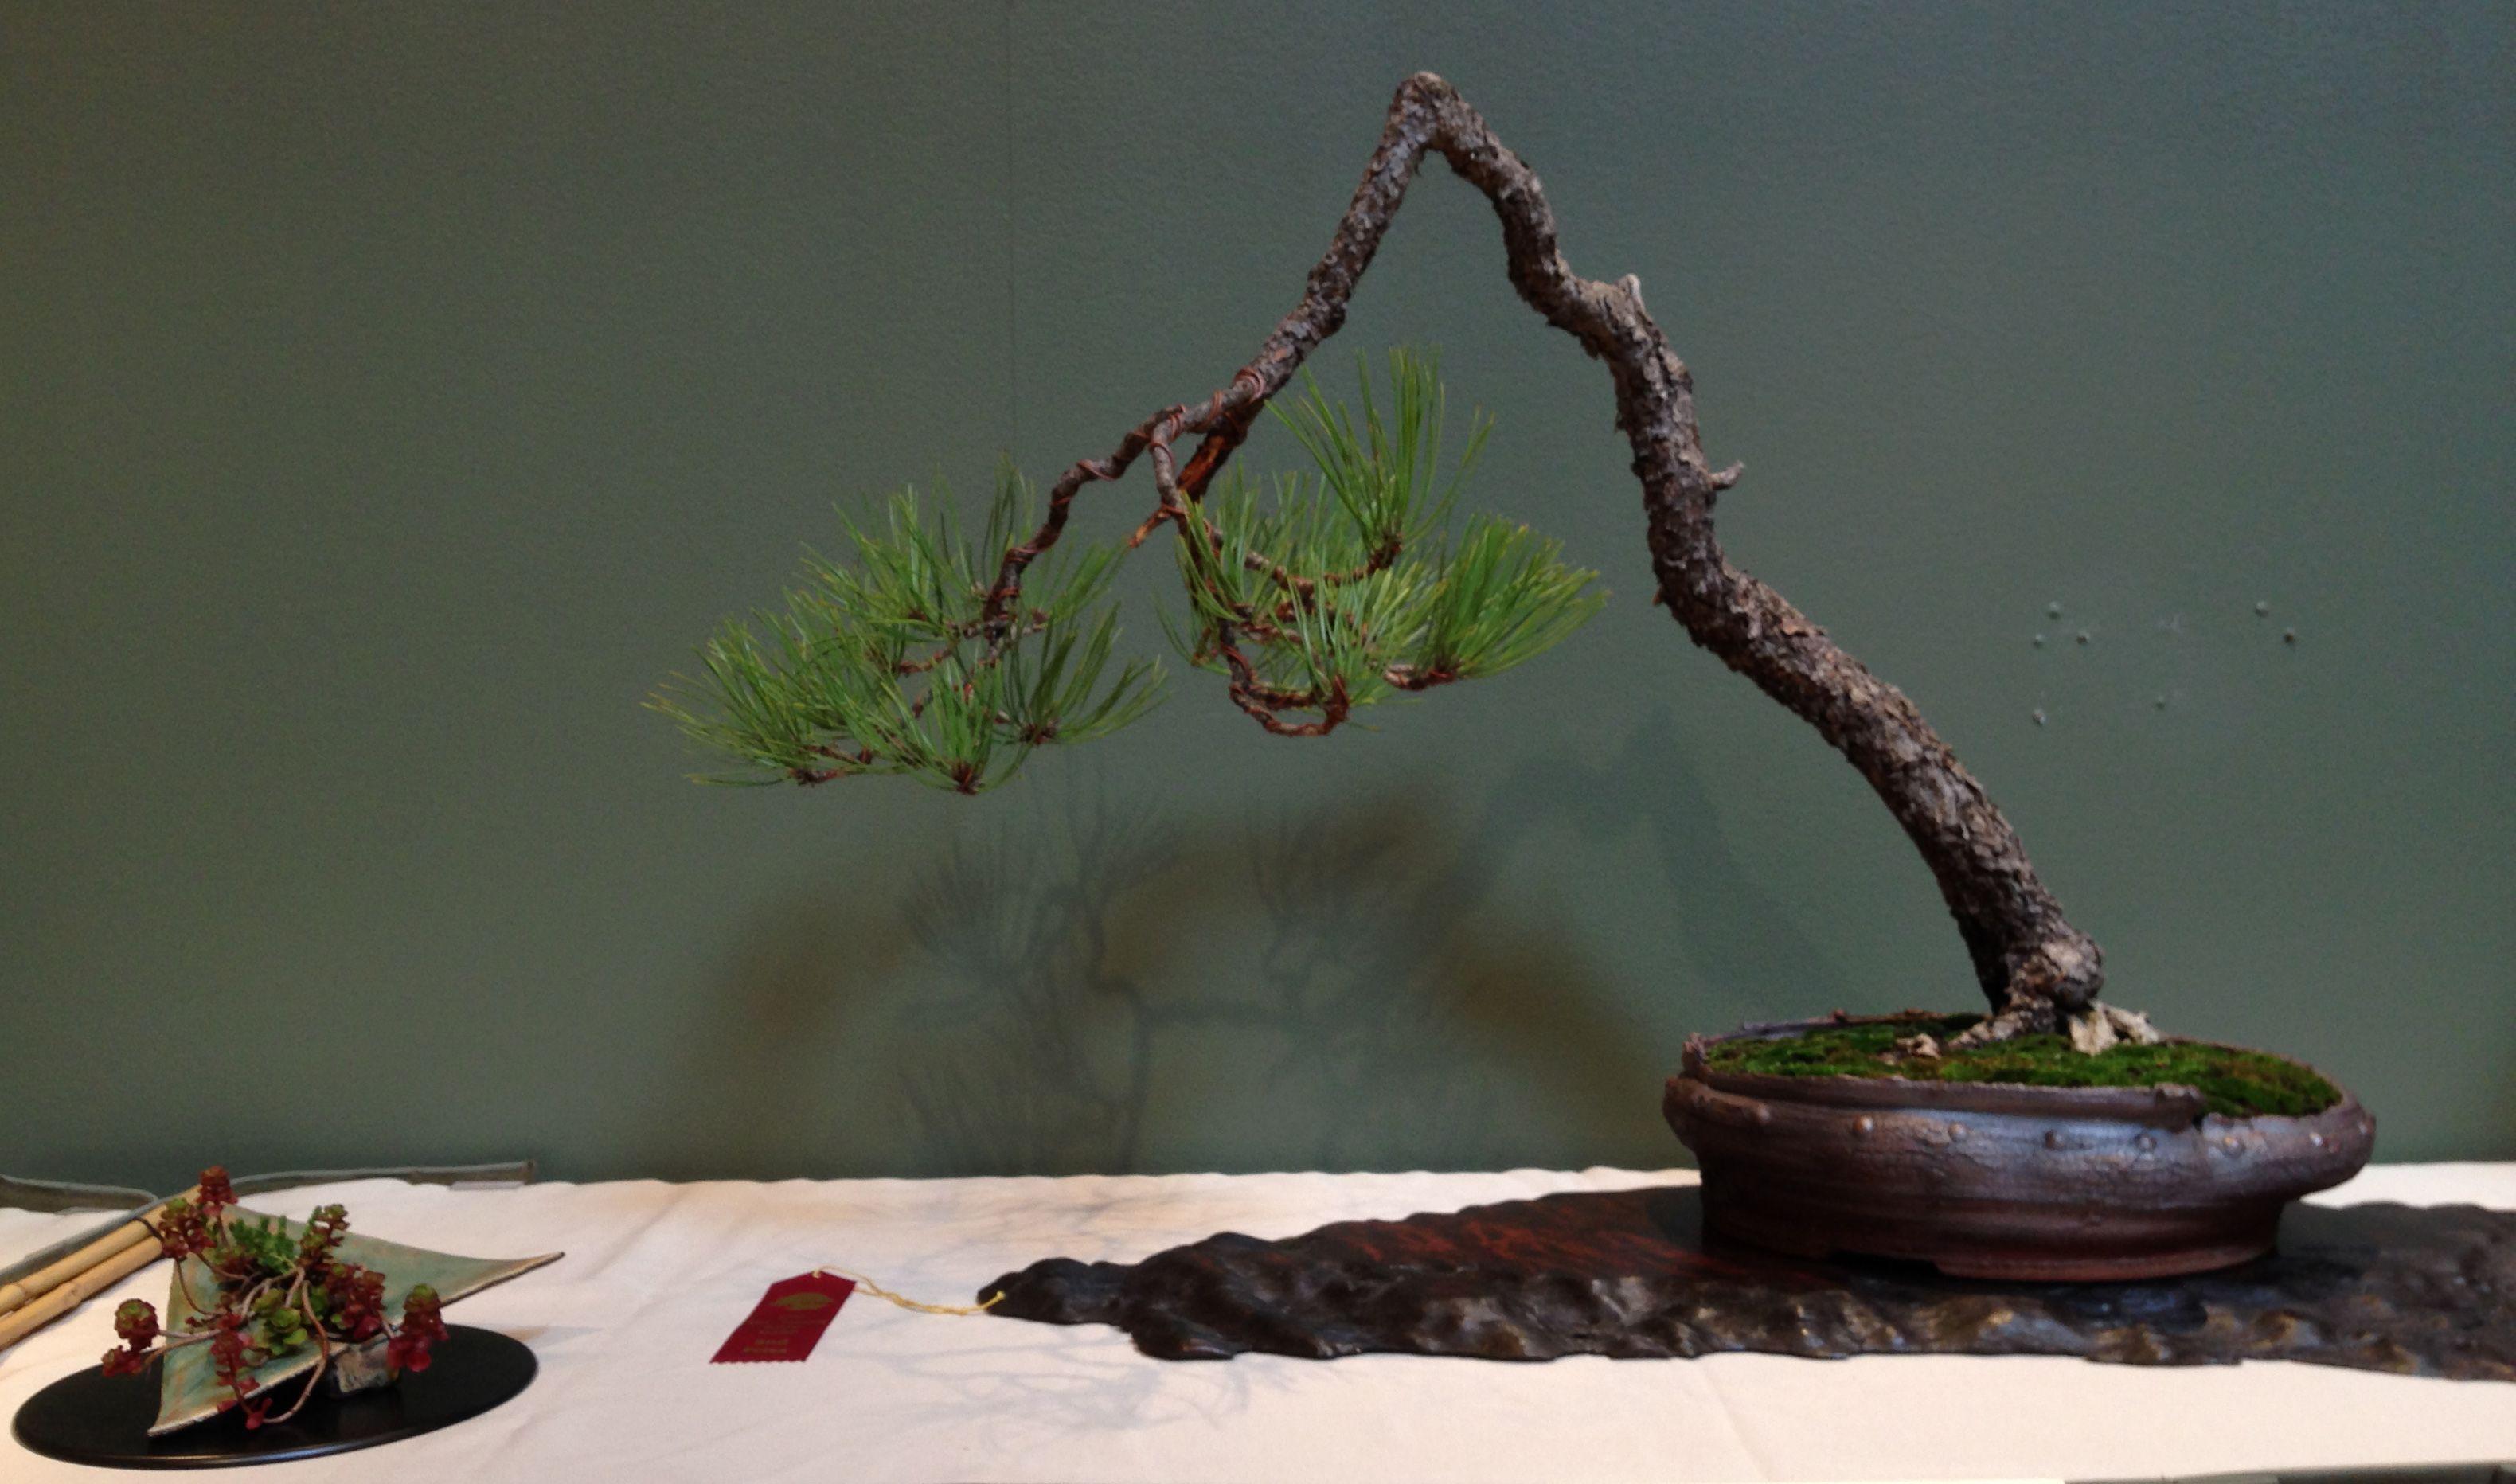 Pin On 2015 Mid America Bonsai Exhibit